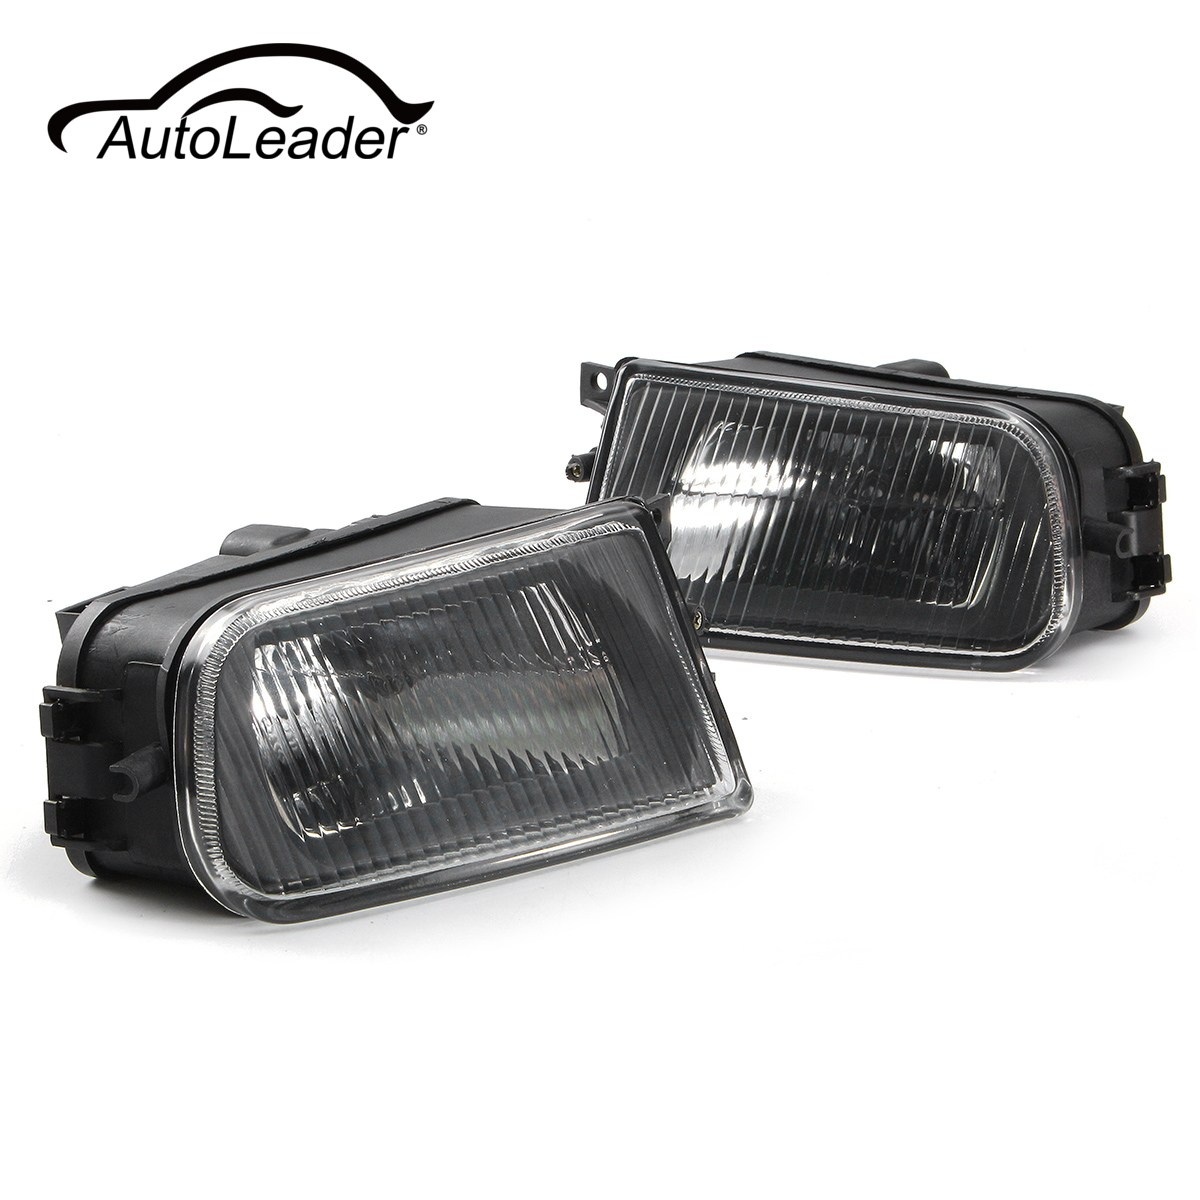 AutoLeader 1 Pair Left/Right Black Fog Lights Bumper Lamp Housing for BMW E39 5-Series 97-00/ Z3 97-01 63178360575 63178381977